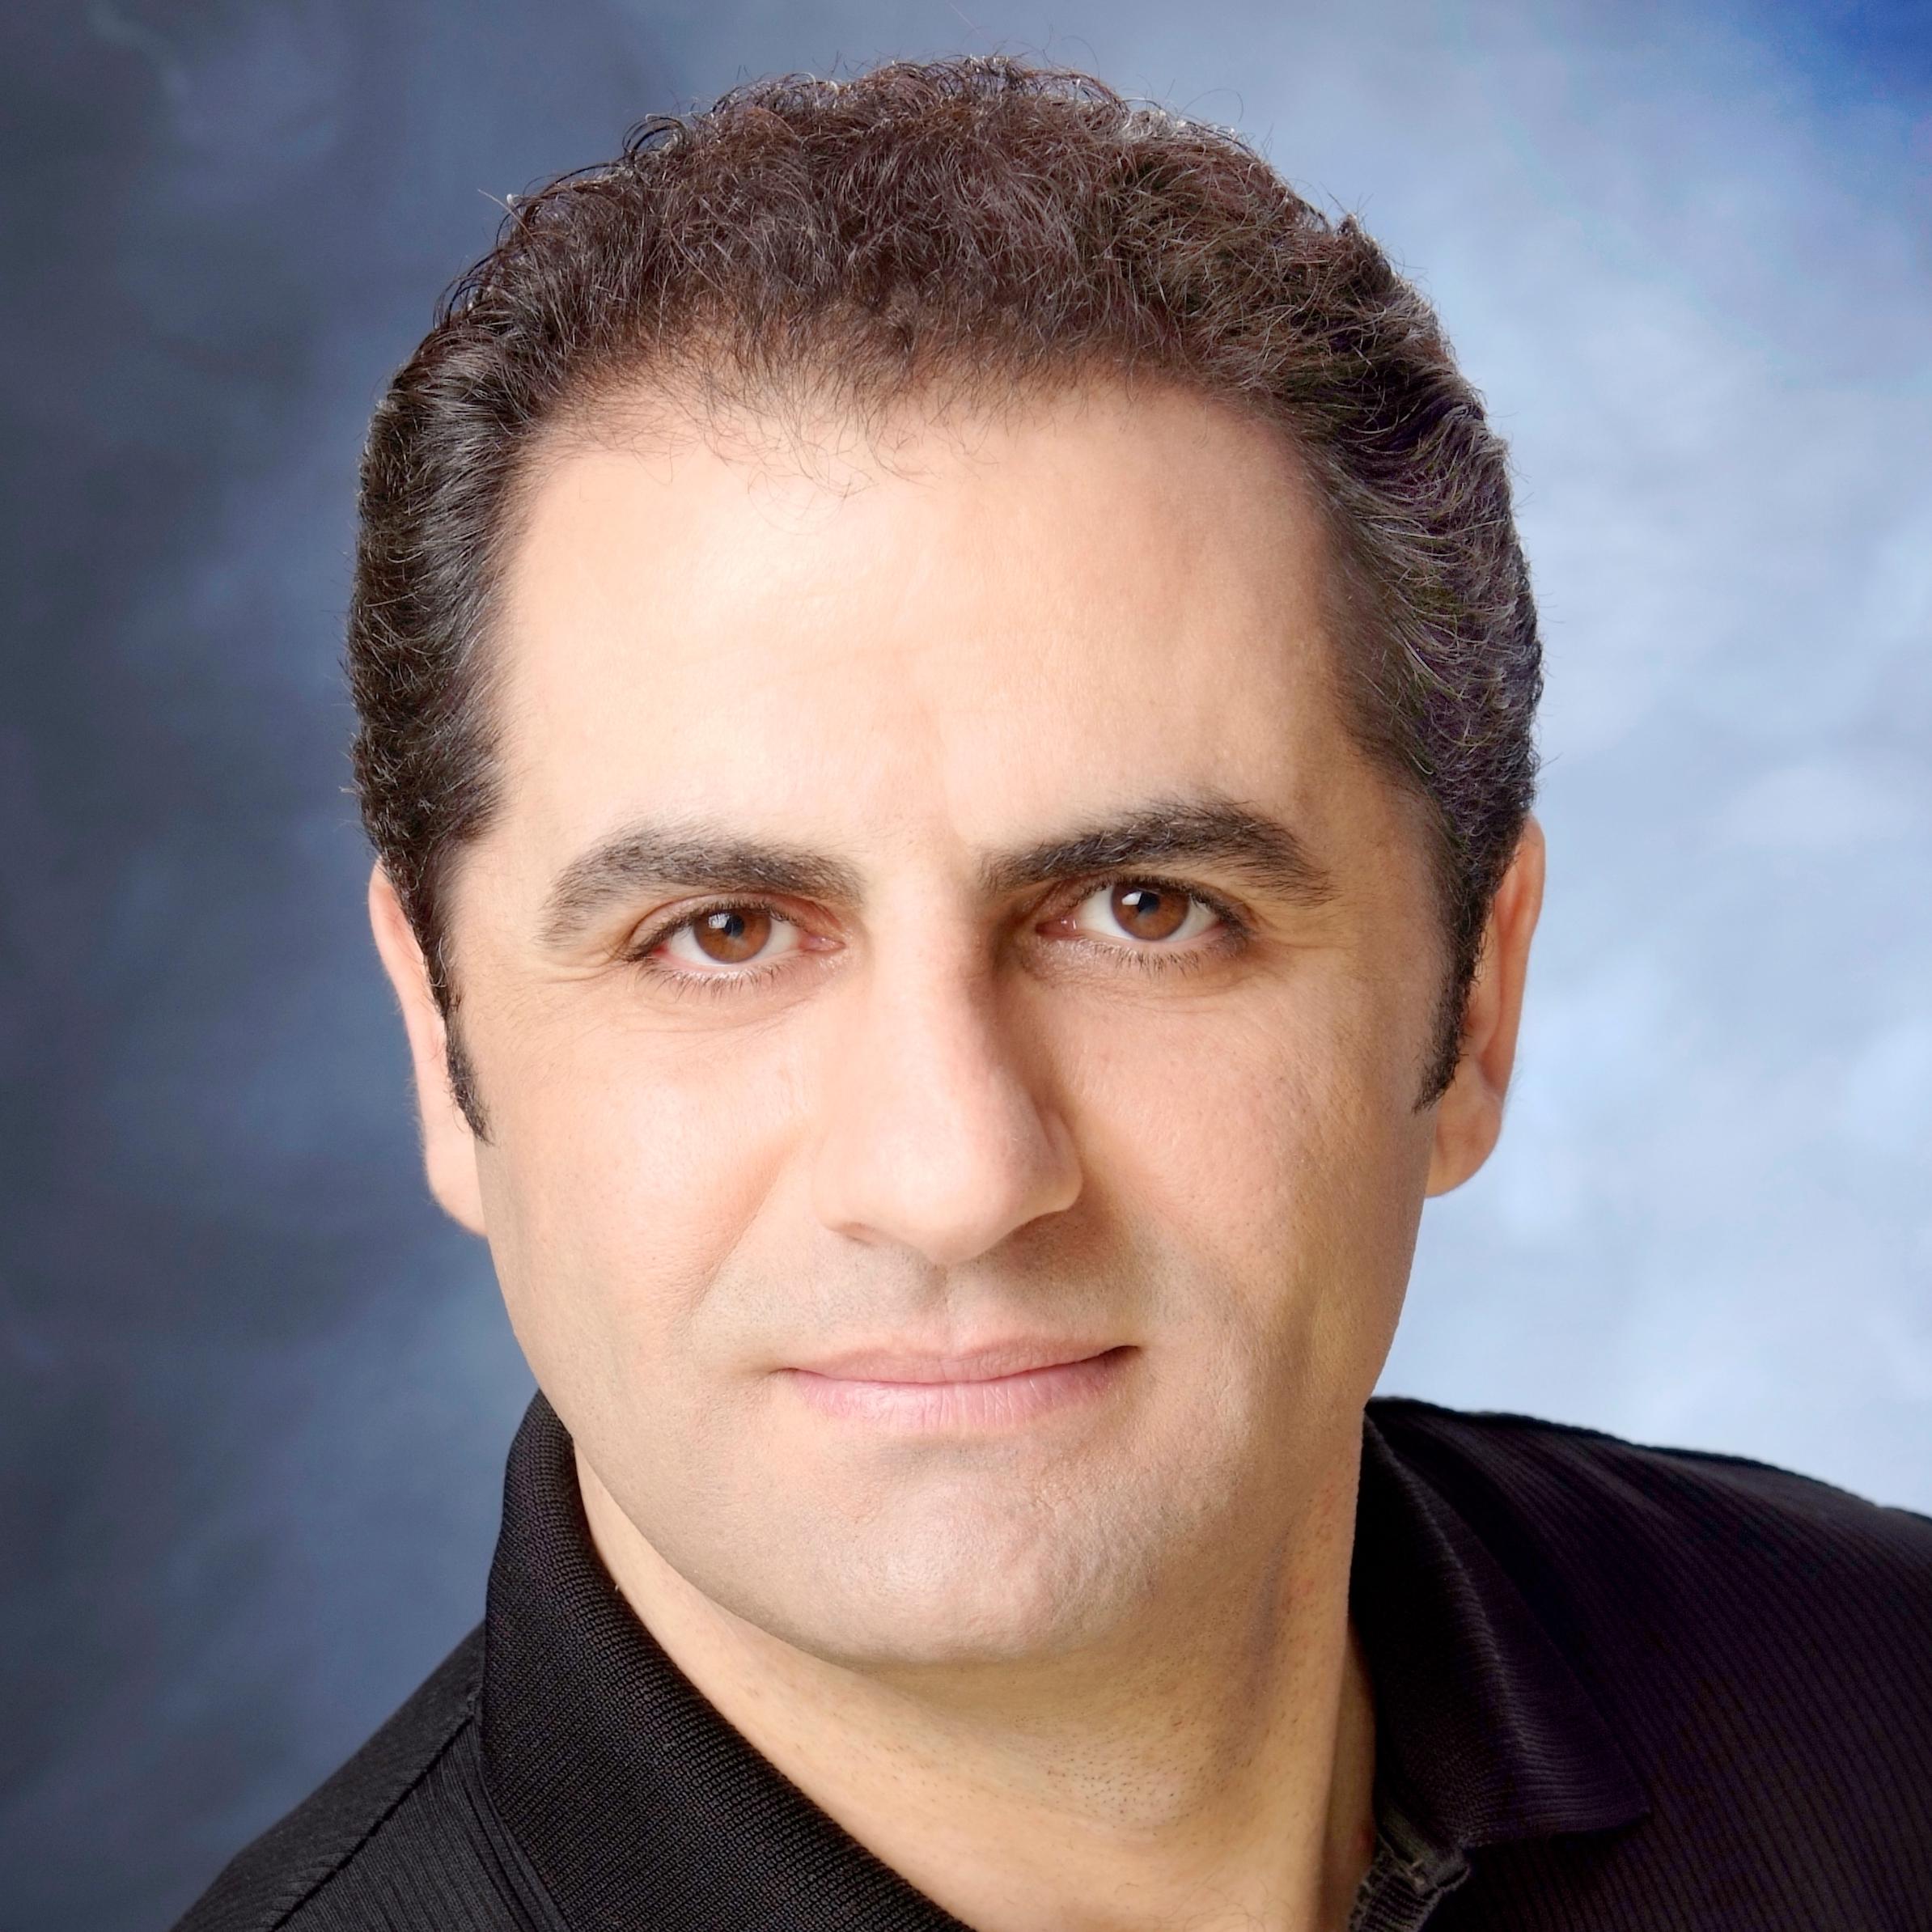 Yeghishe Manucharyan